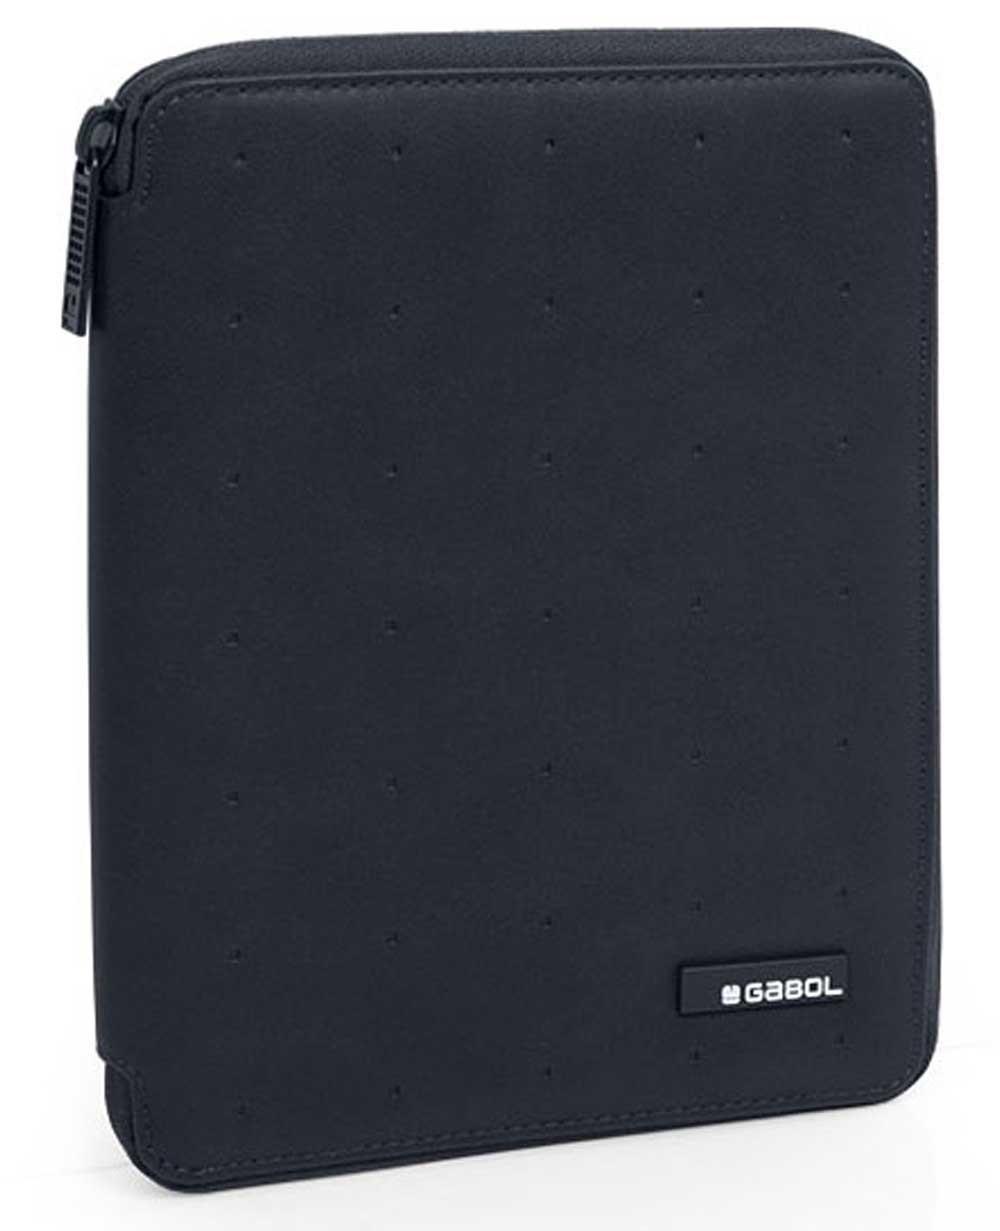 "Gabol Alpha 8"" Portafolio A5 tablet Negro (Foto )"